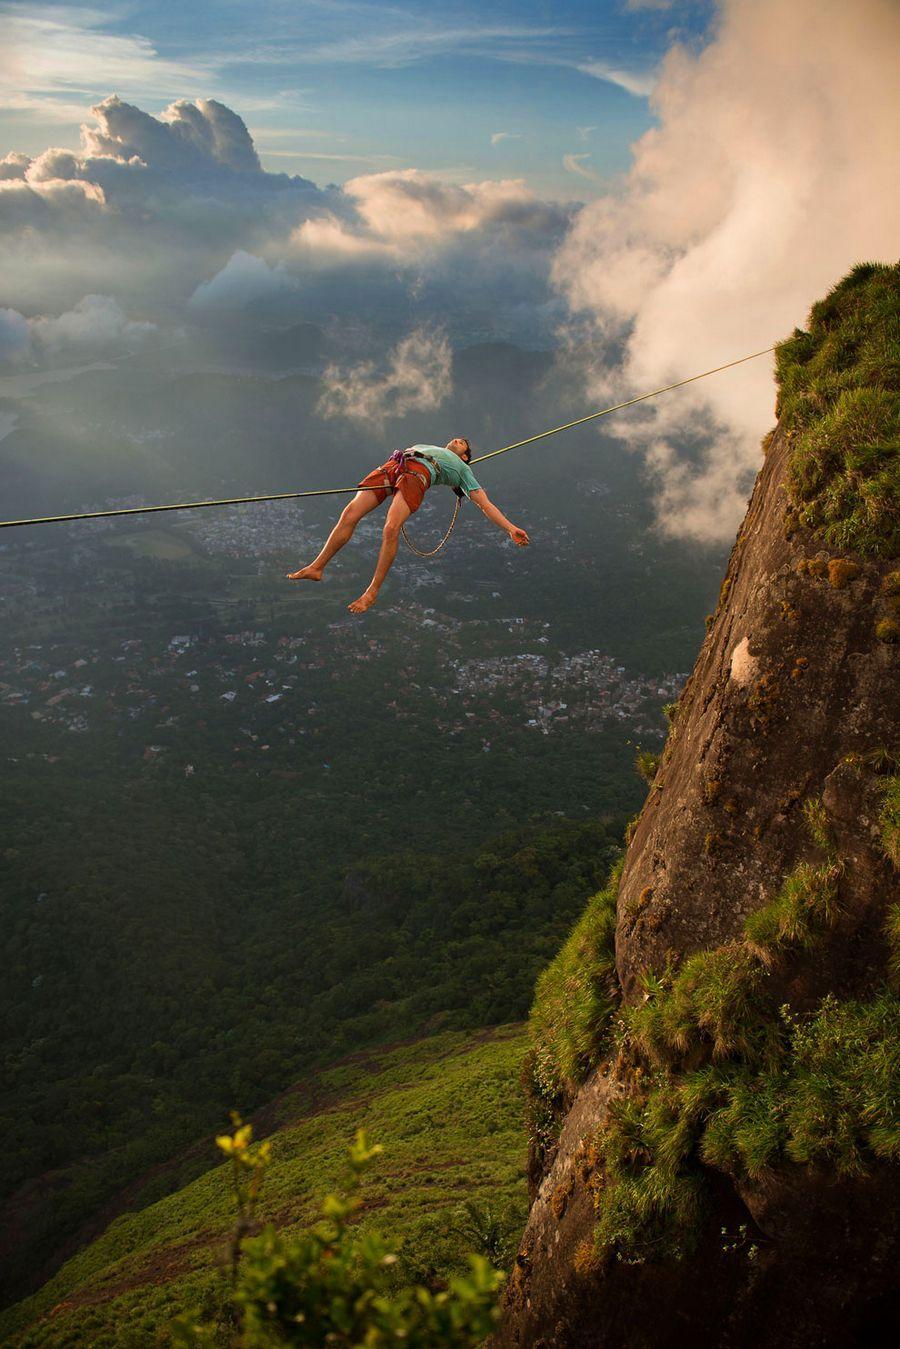 Extreme Sports Slackline over Rio Vide